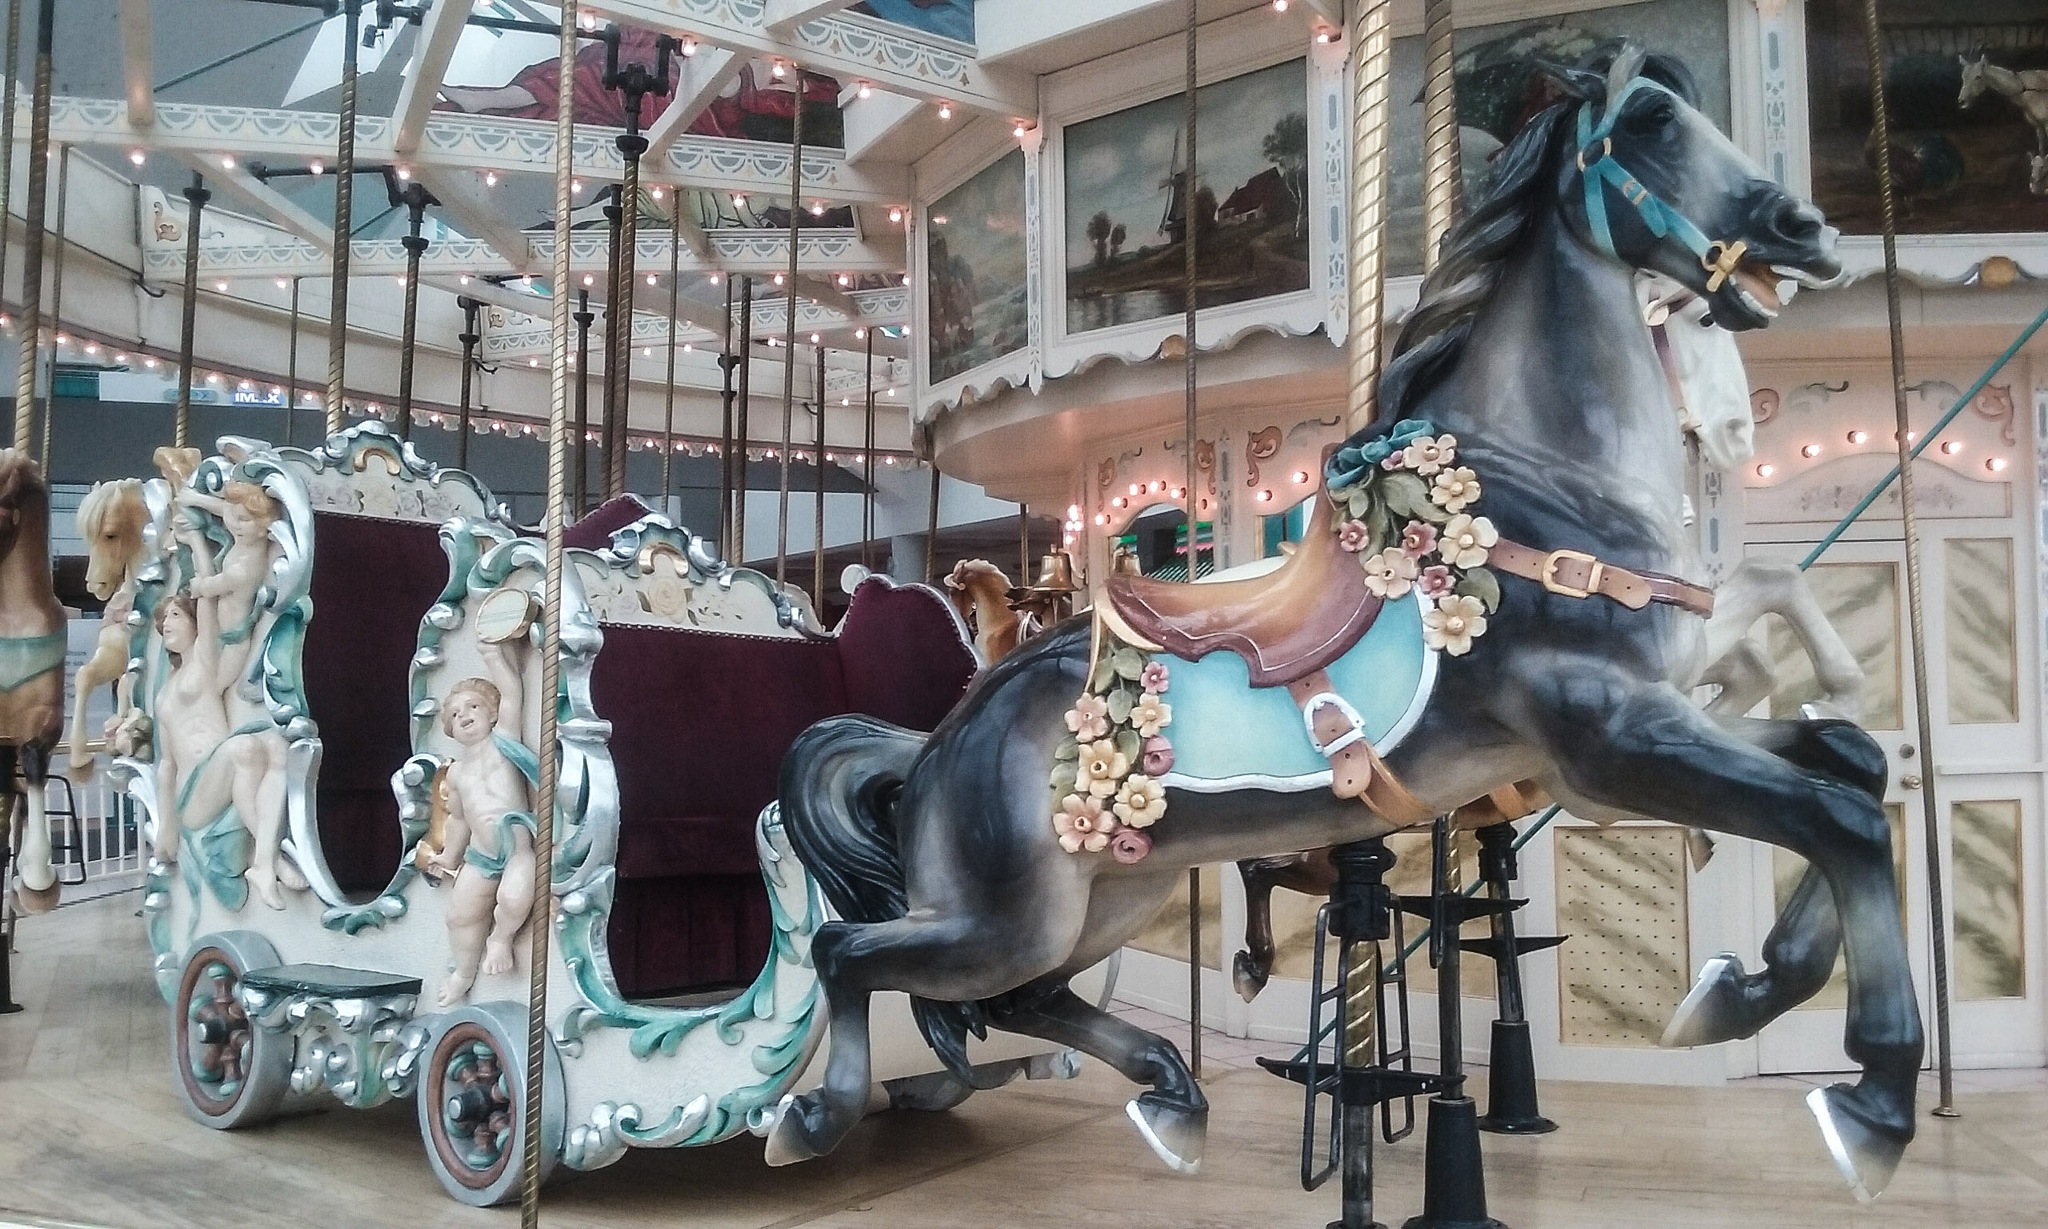 Carousel by Mark Morrison-LeMay